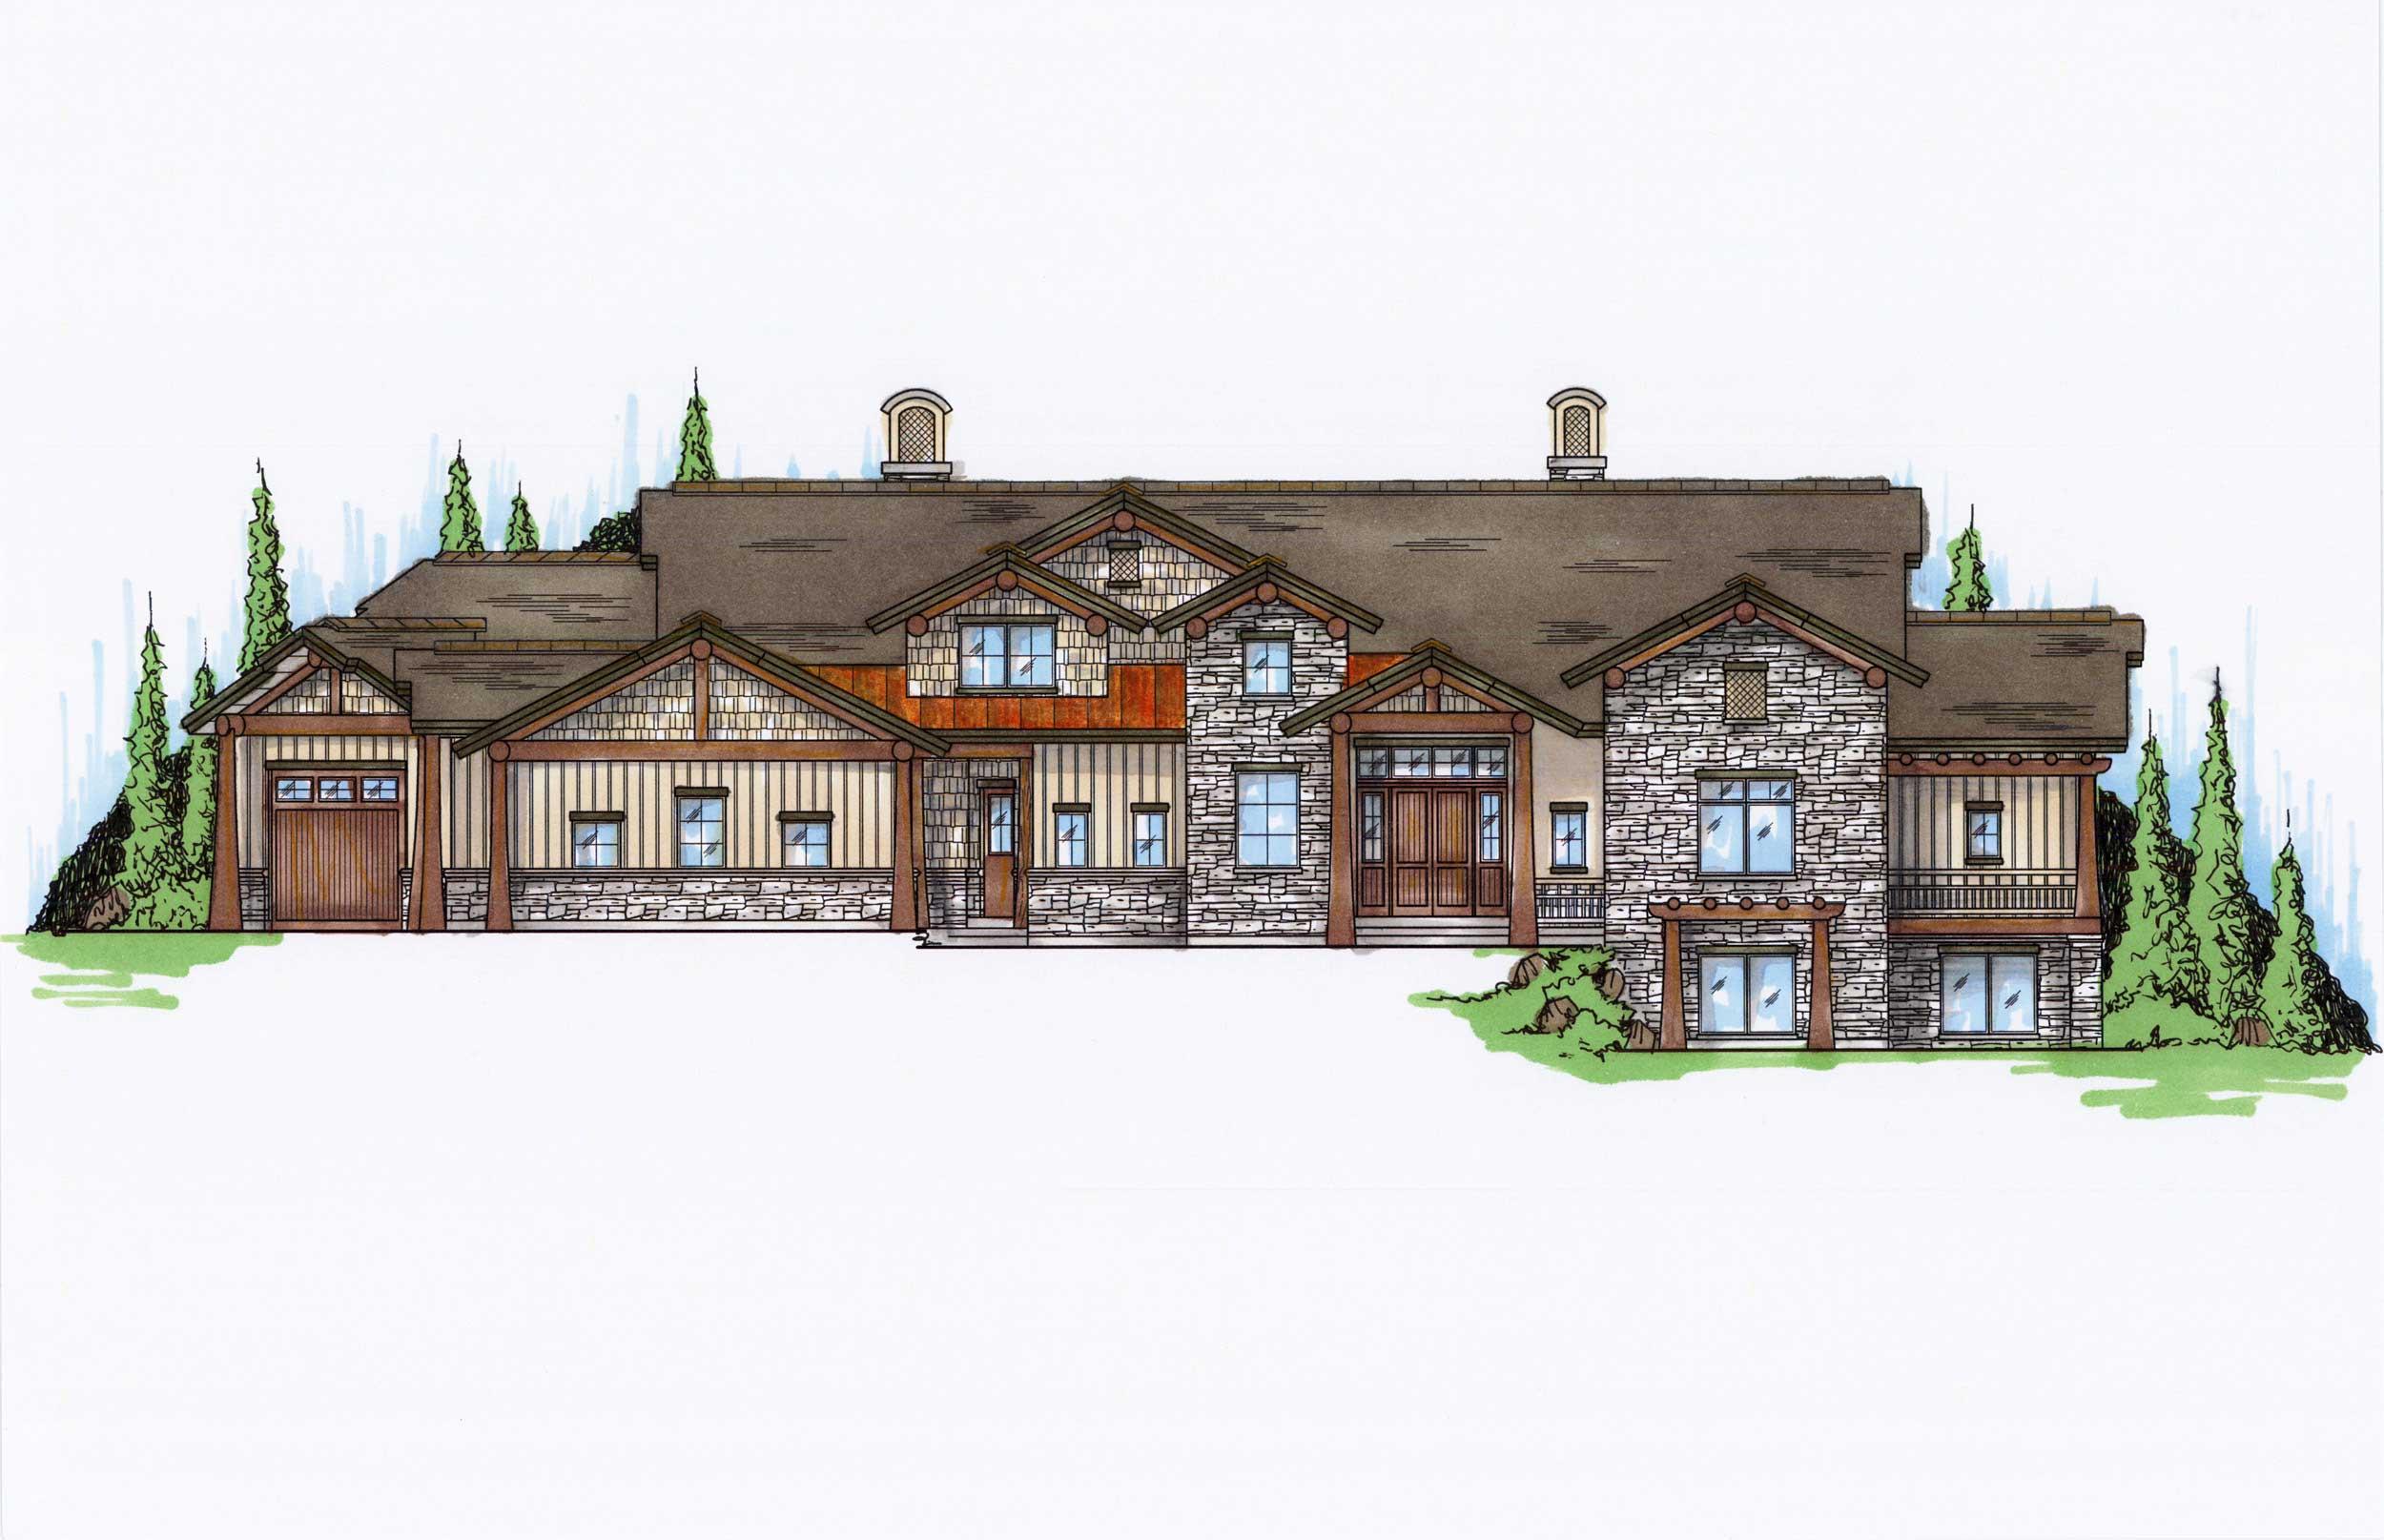 5 bedroom craftsman luxury house plans home design 135 1036 for 5 bedroom luxury house plans